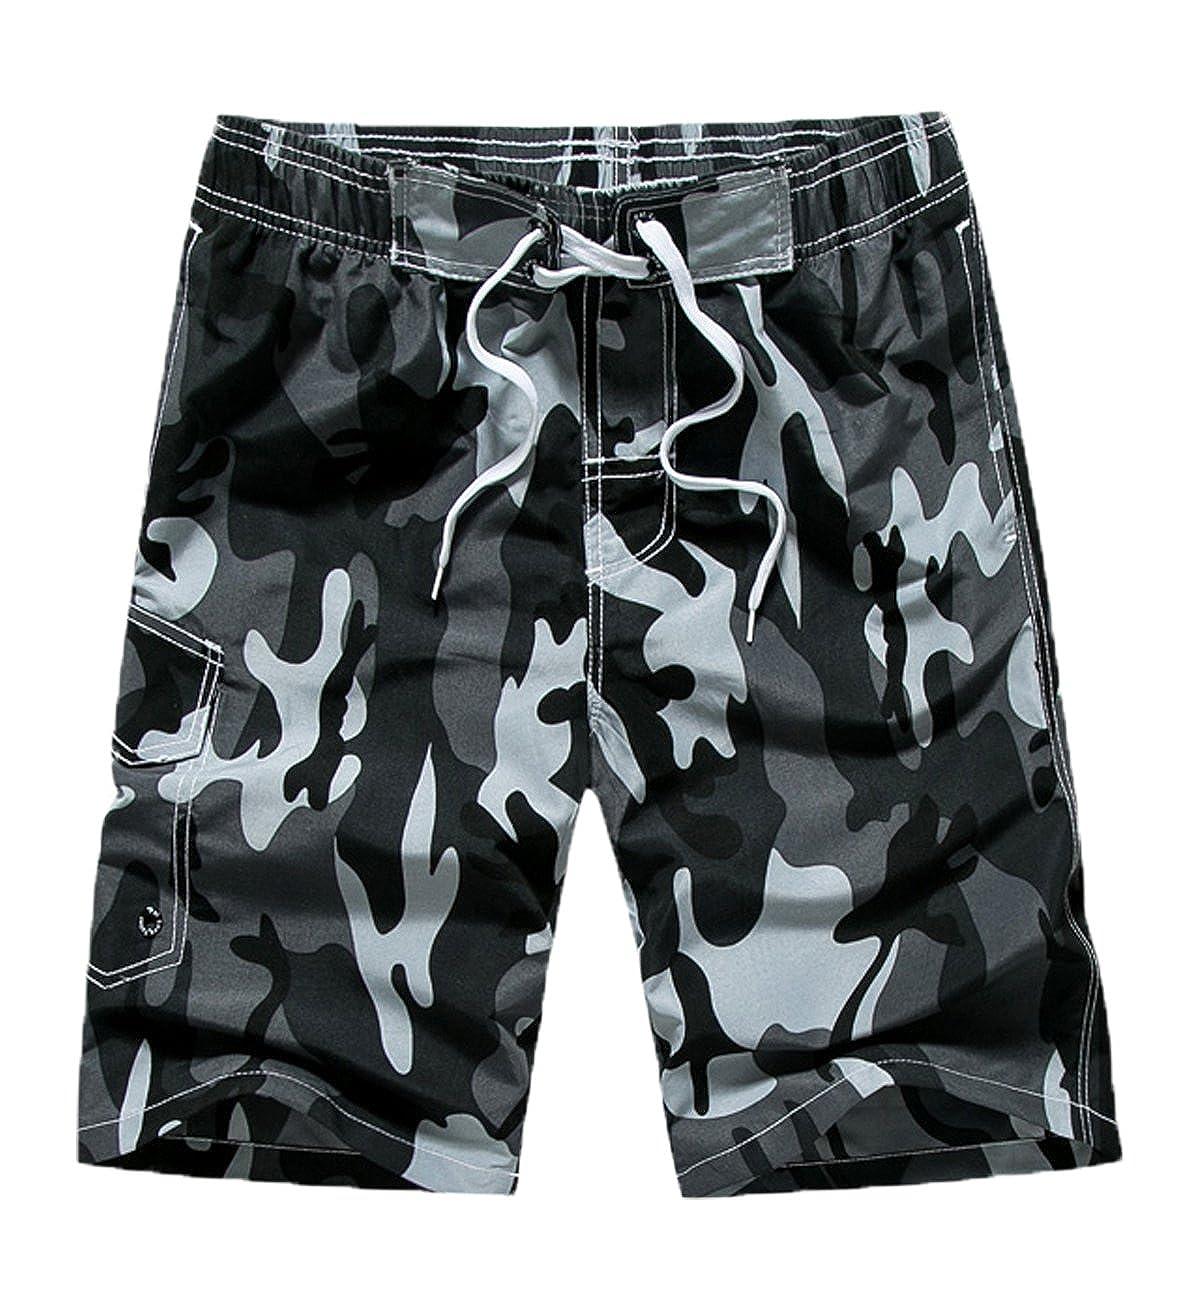 Mens Camouflage Coconut Tree Print Quick Dry Lightweight Beach Short Swim Trunk Three Pocket Mesh Lining